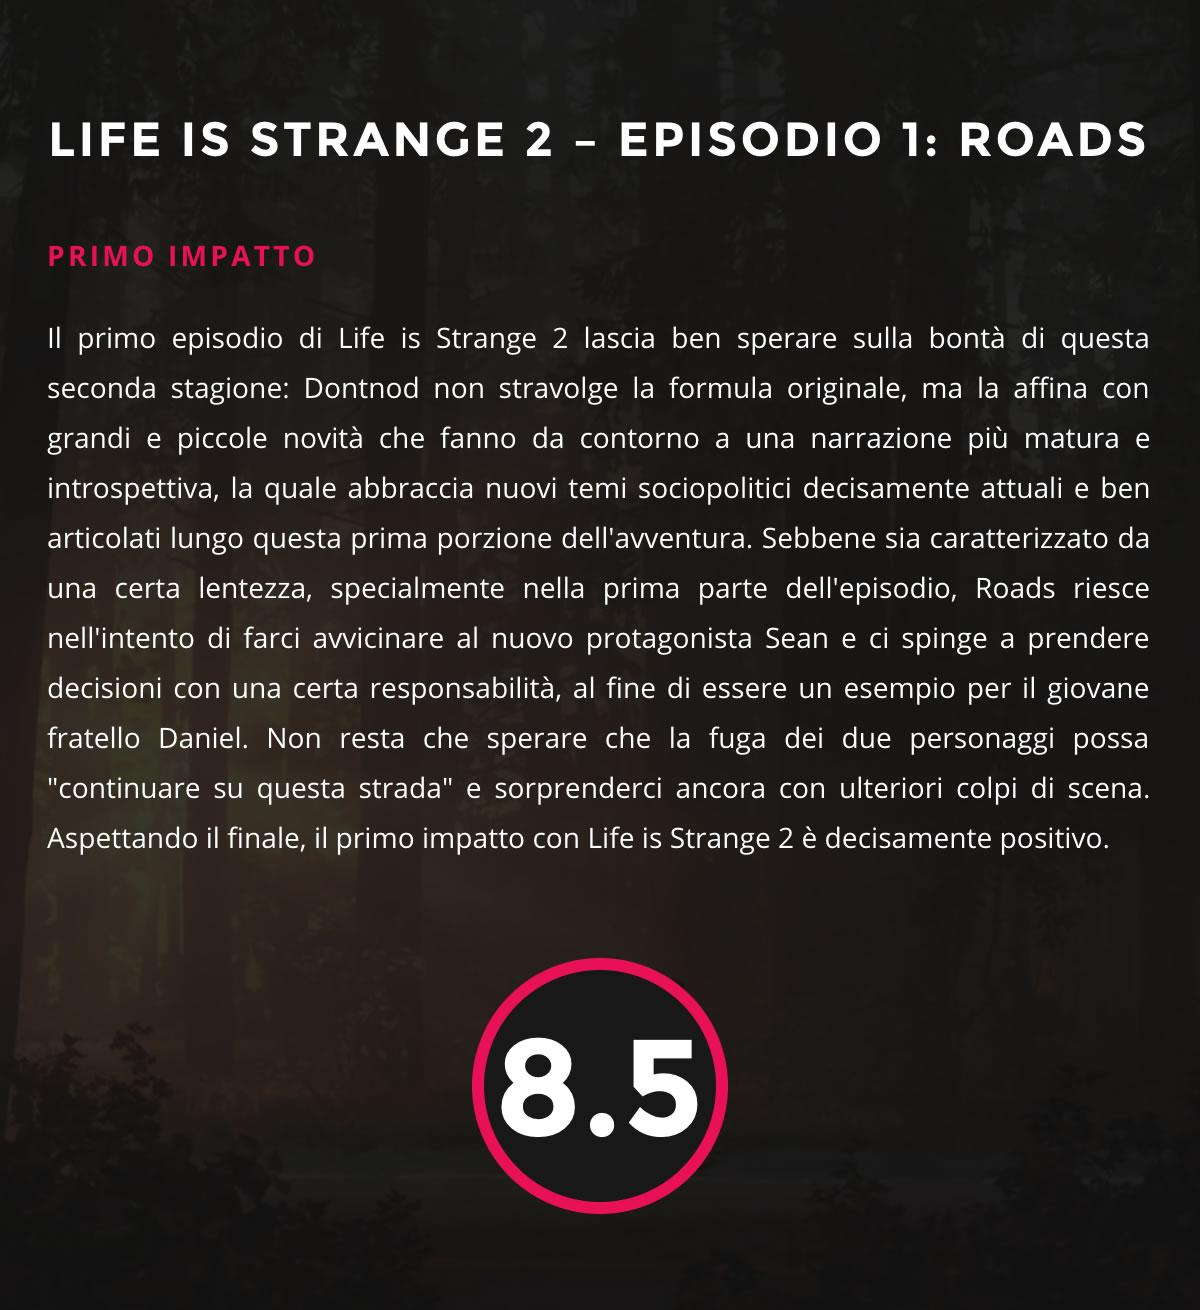 Life is Strange 2 - Primo Impatto